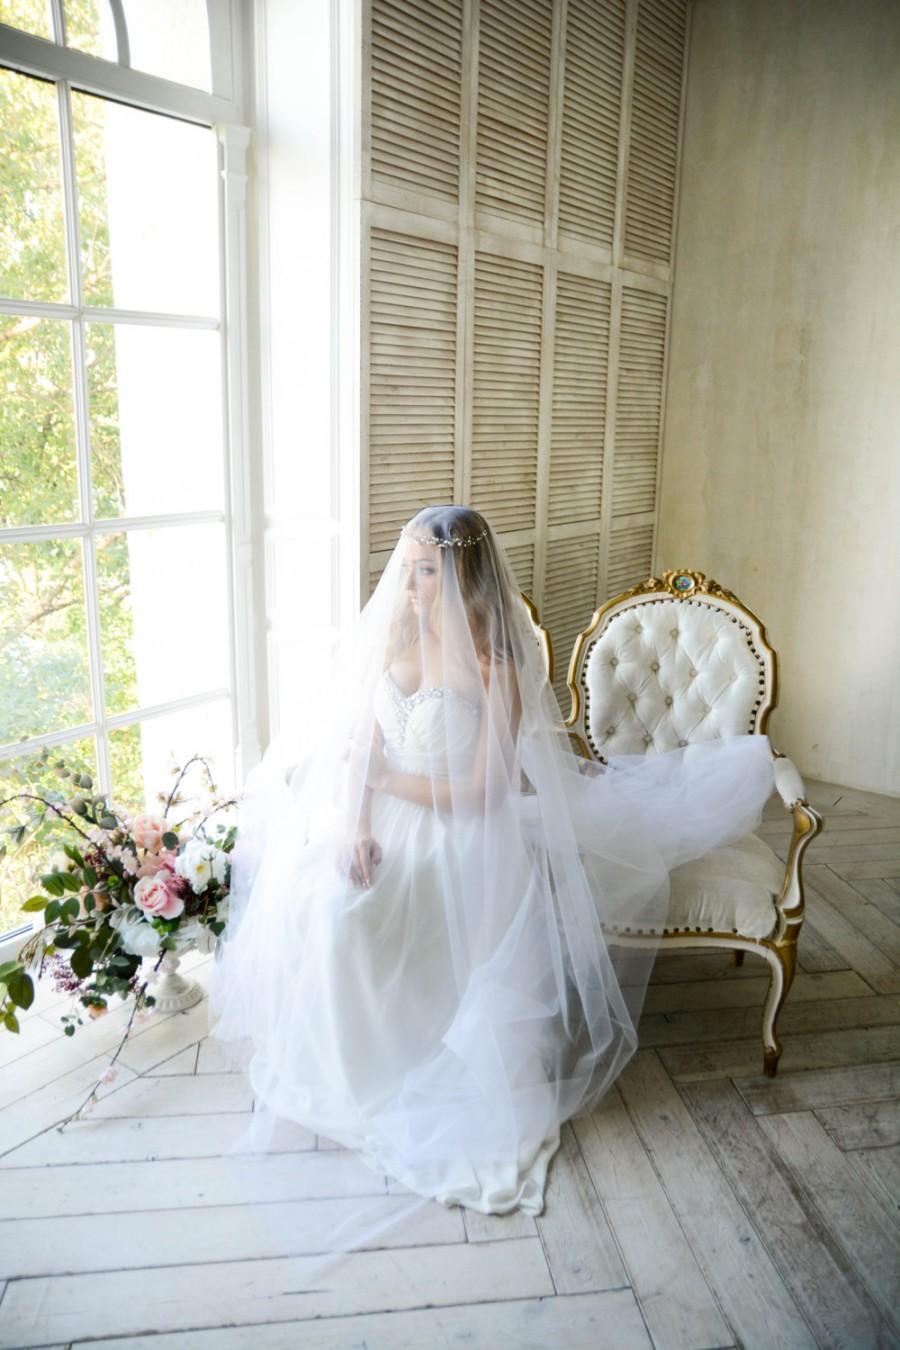 Hochzeit - Chapel Lenght Bridal Veil - Wedding Veil - Chapel Lenght Tulle Veil - White Bridal Veil - White Tulle Veil - Chapel Length Wedding Veil